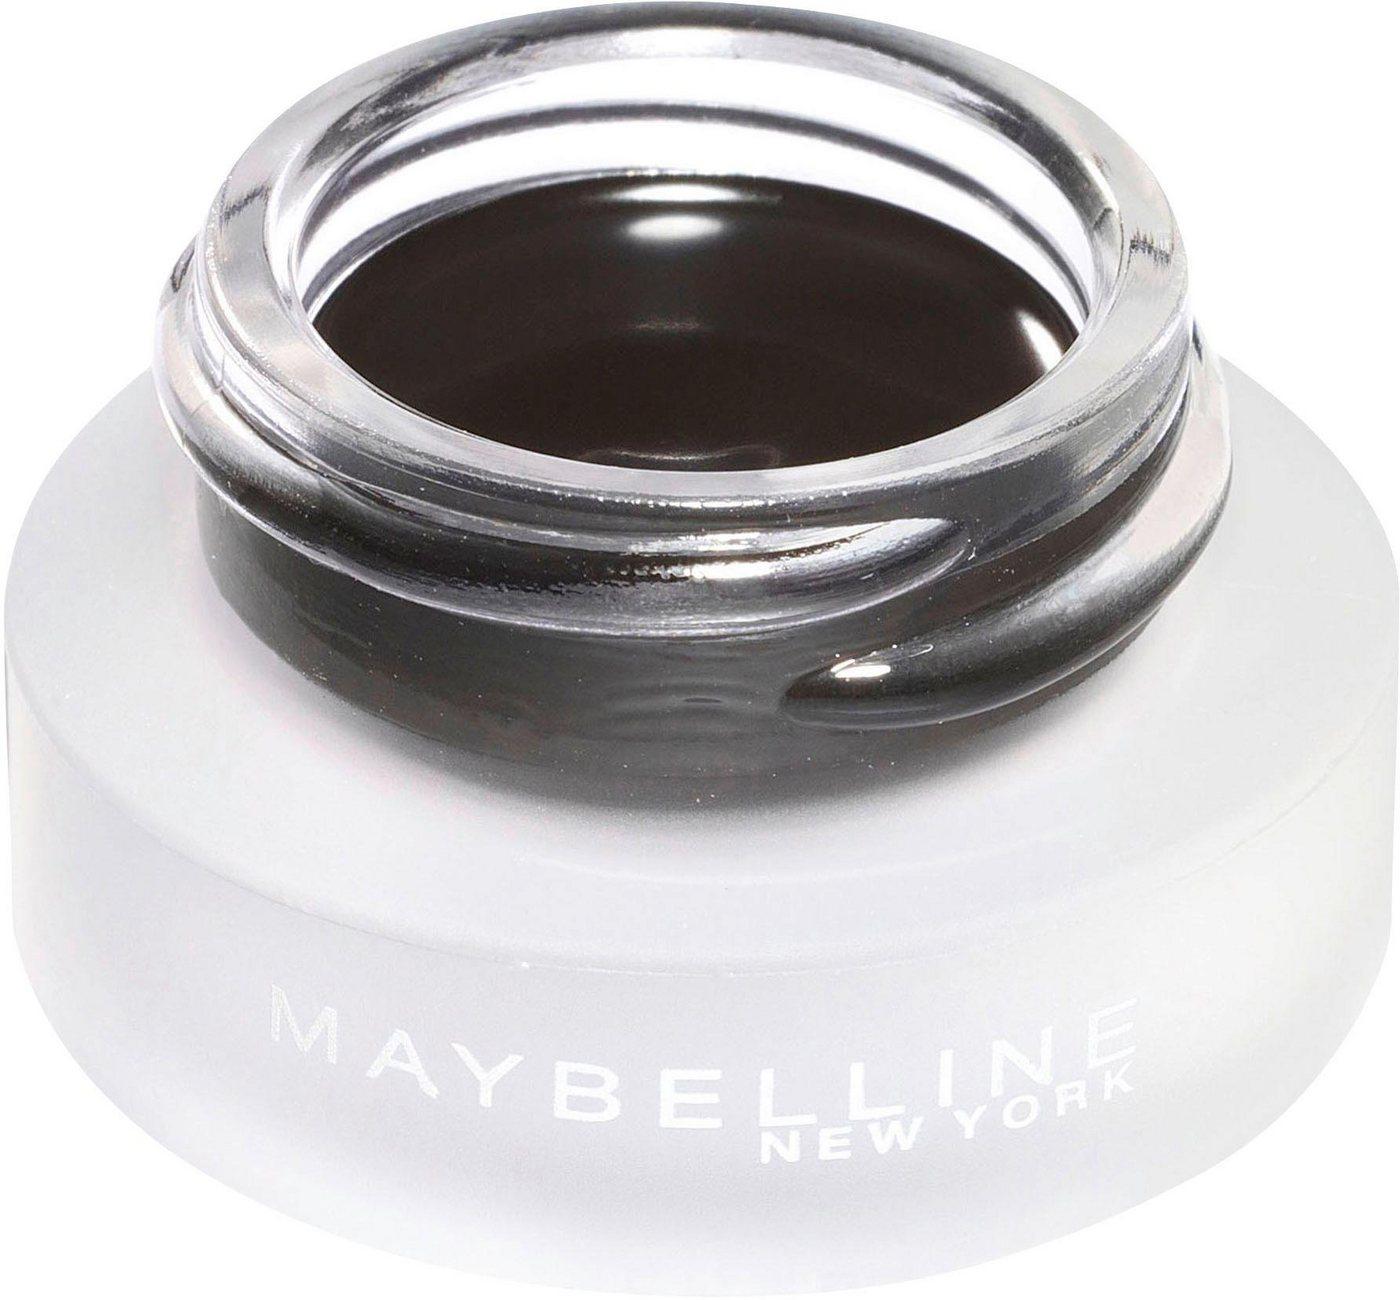 maybelline new york -  Eyeliner »Lasting Drama Gel Liner«, Hochpigmentierter Gel-Textur